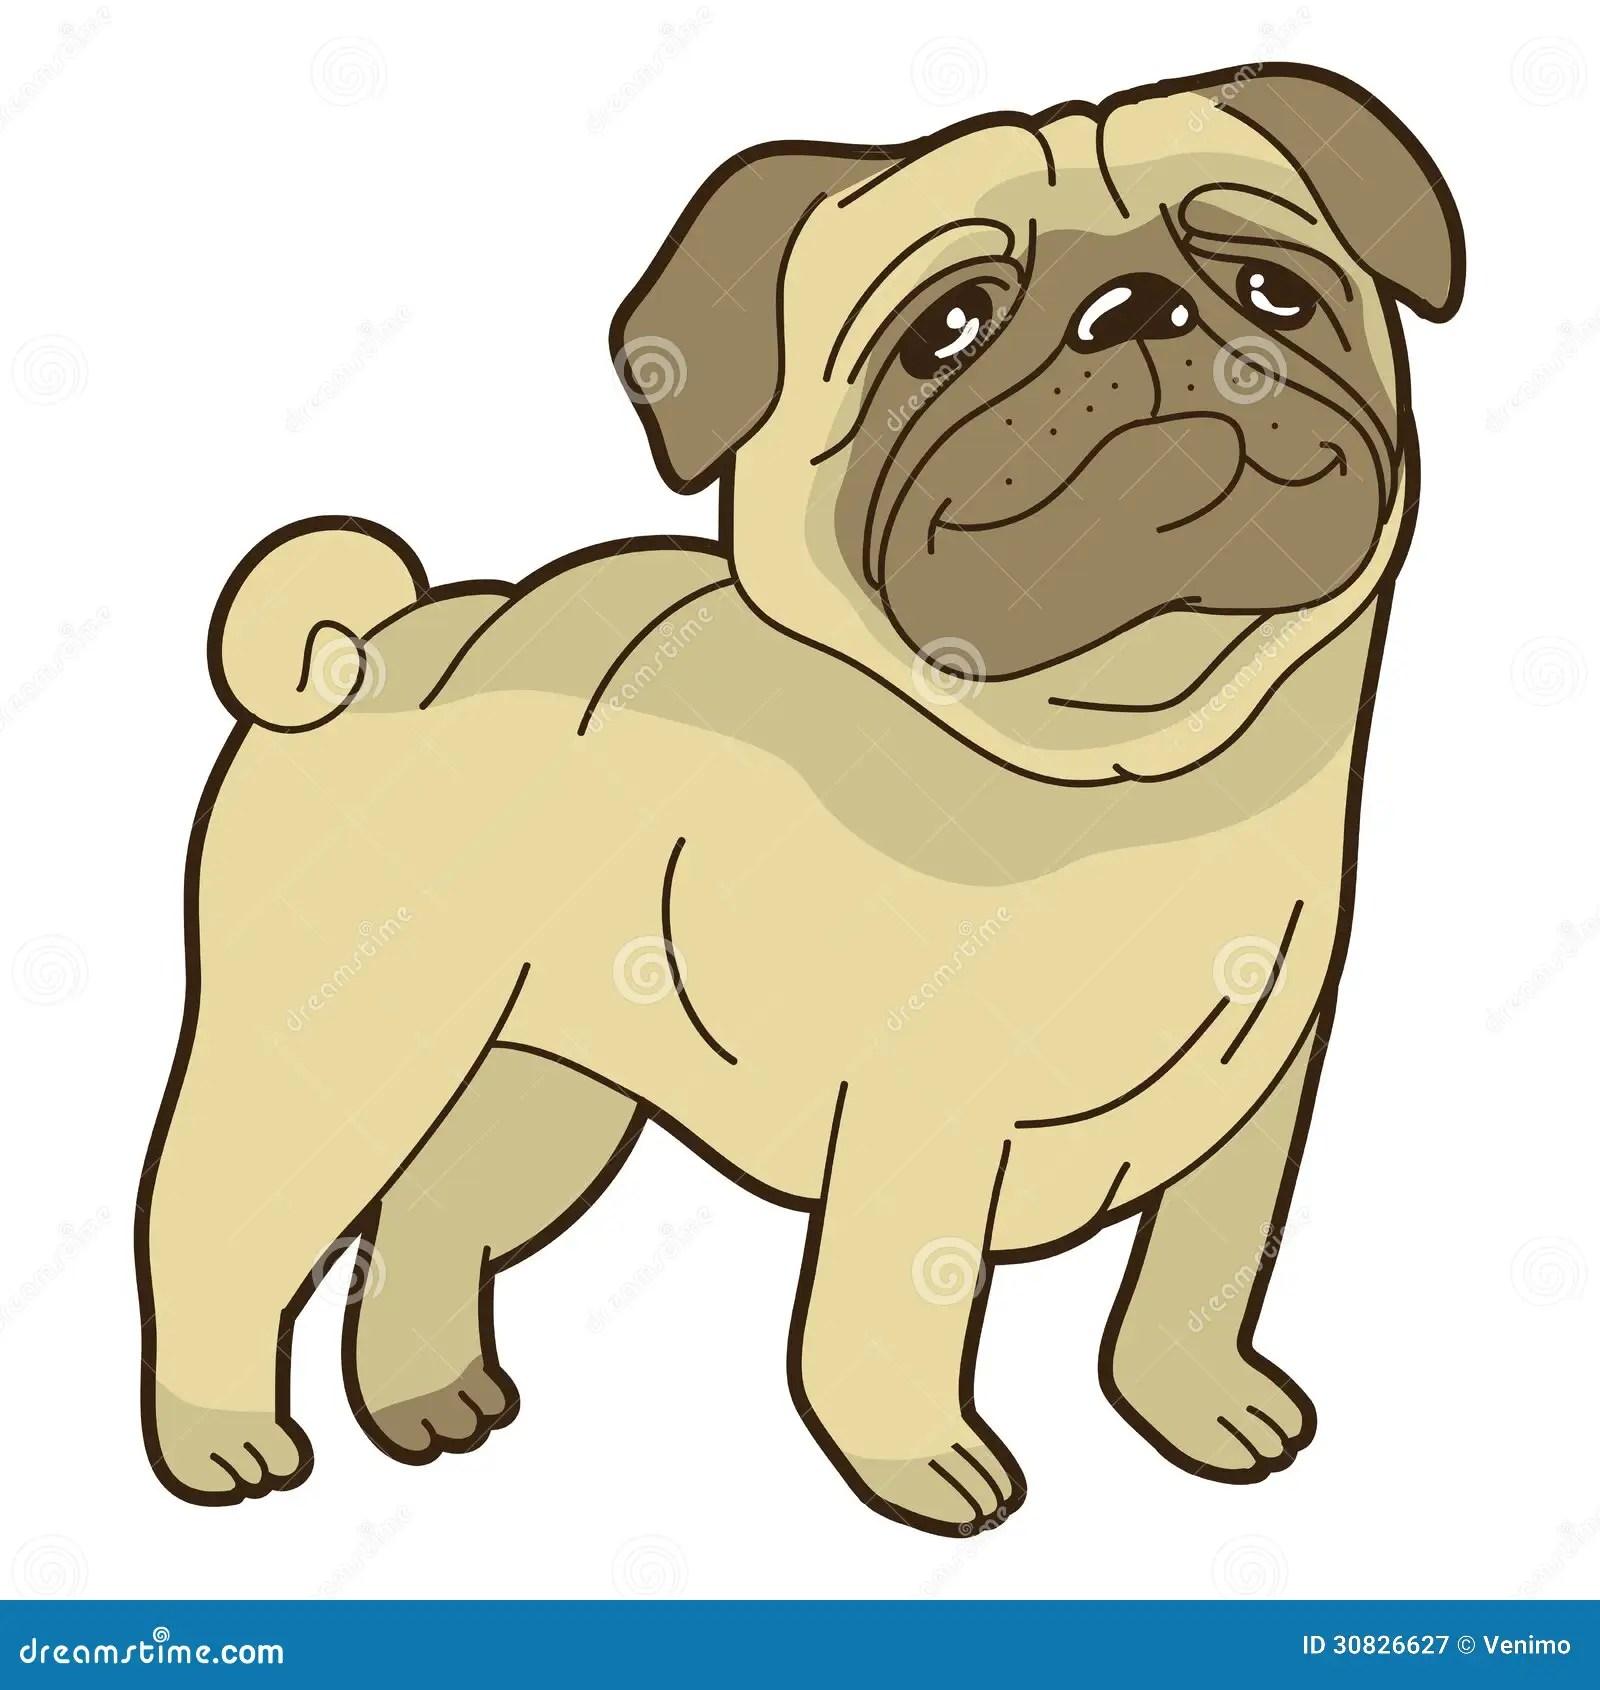 Cute Pug Puppies Wallpapers Vector Funny Cartoon Pug Stock Illustration Illustration